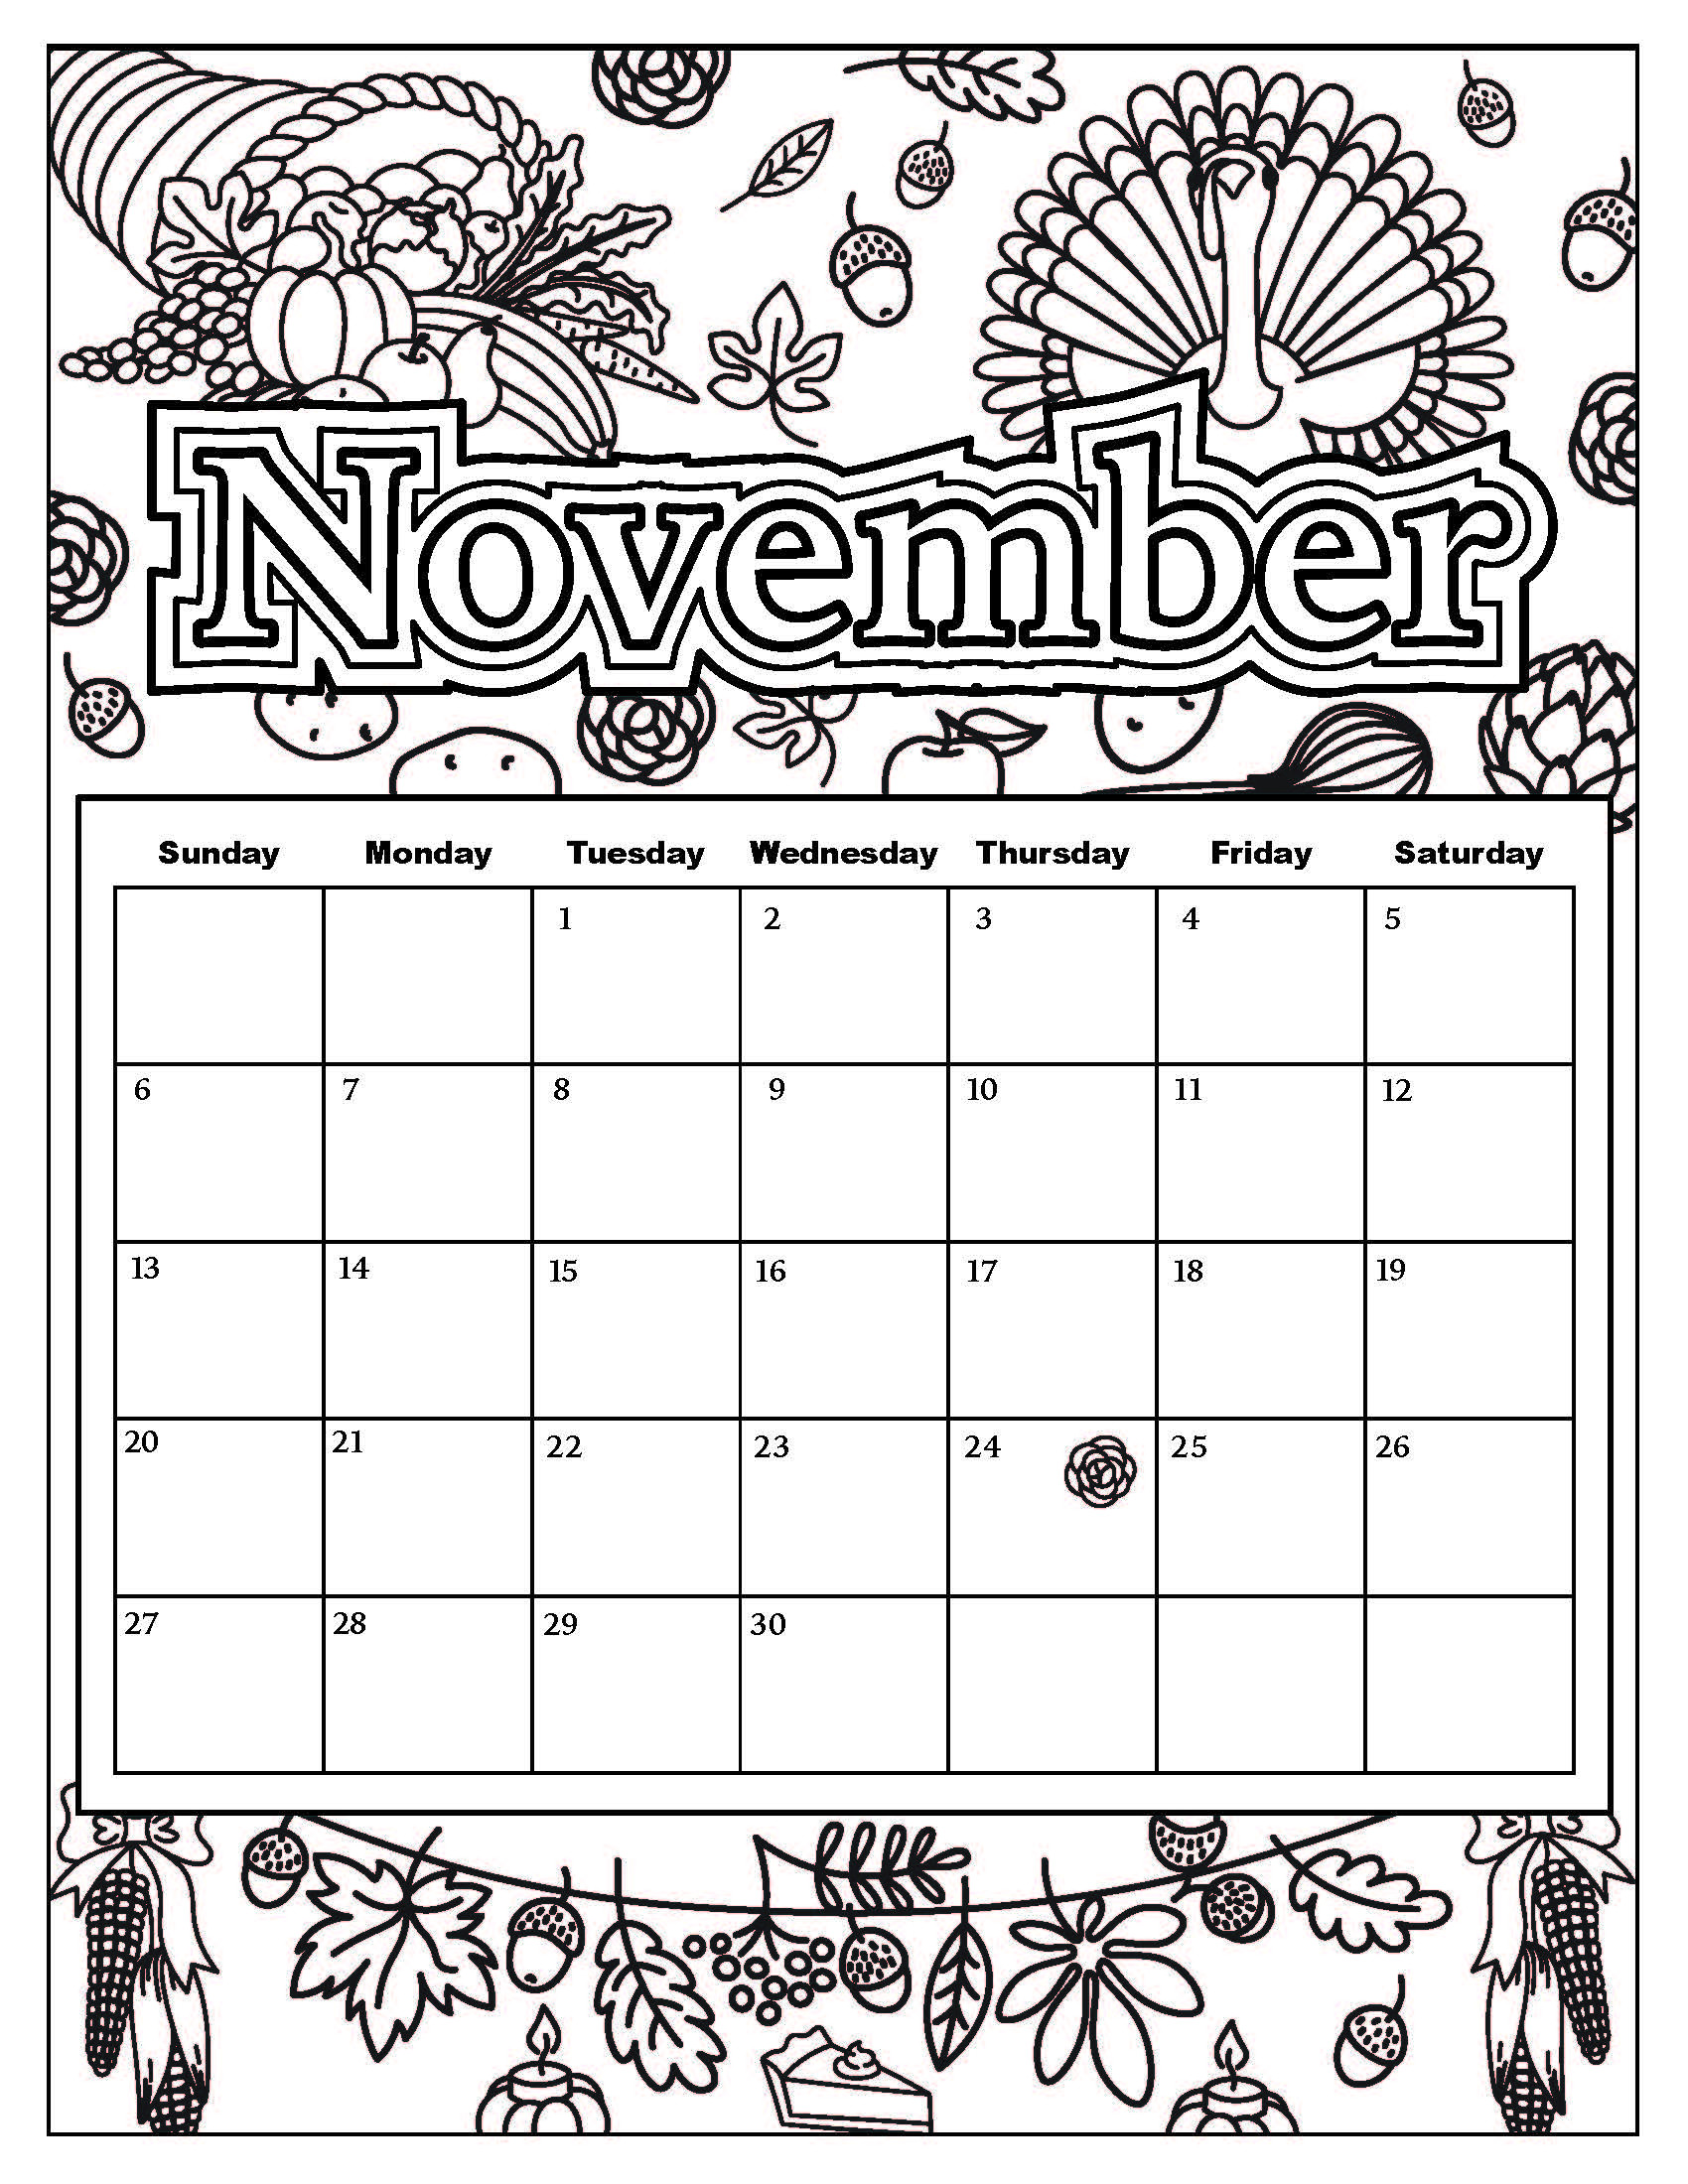 Coloring Book Calendars  October 2016 Calendar Coloring Page